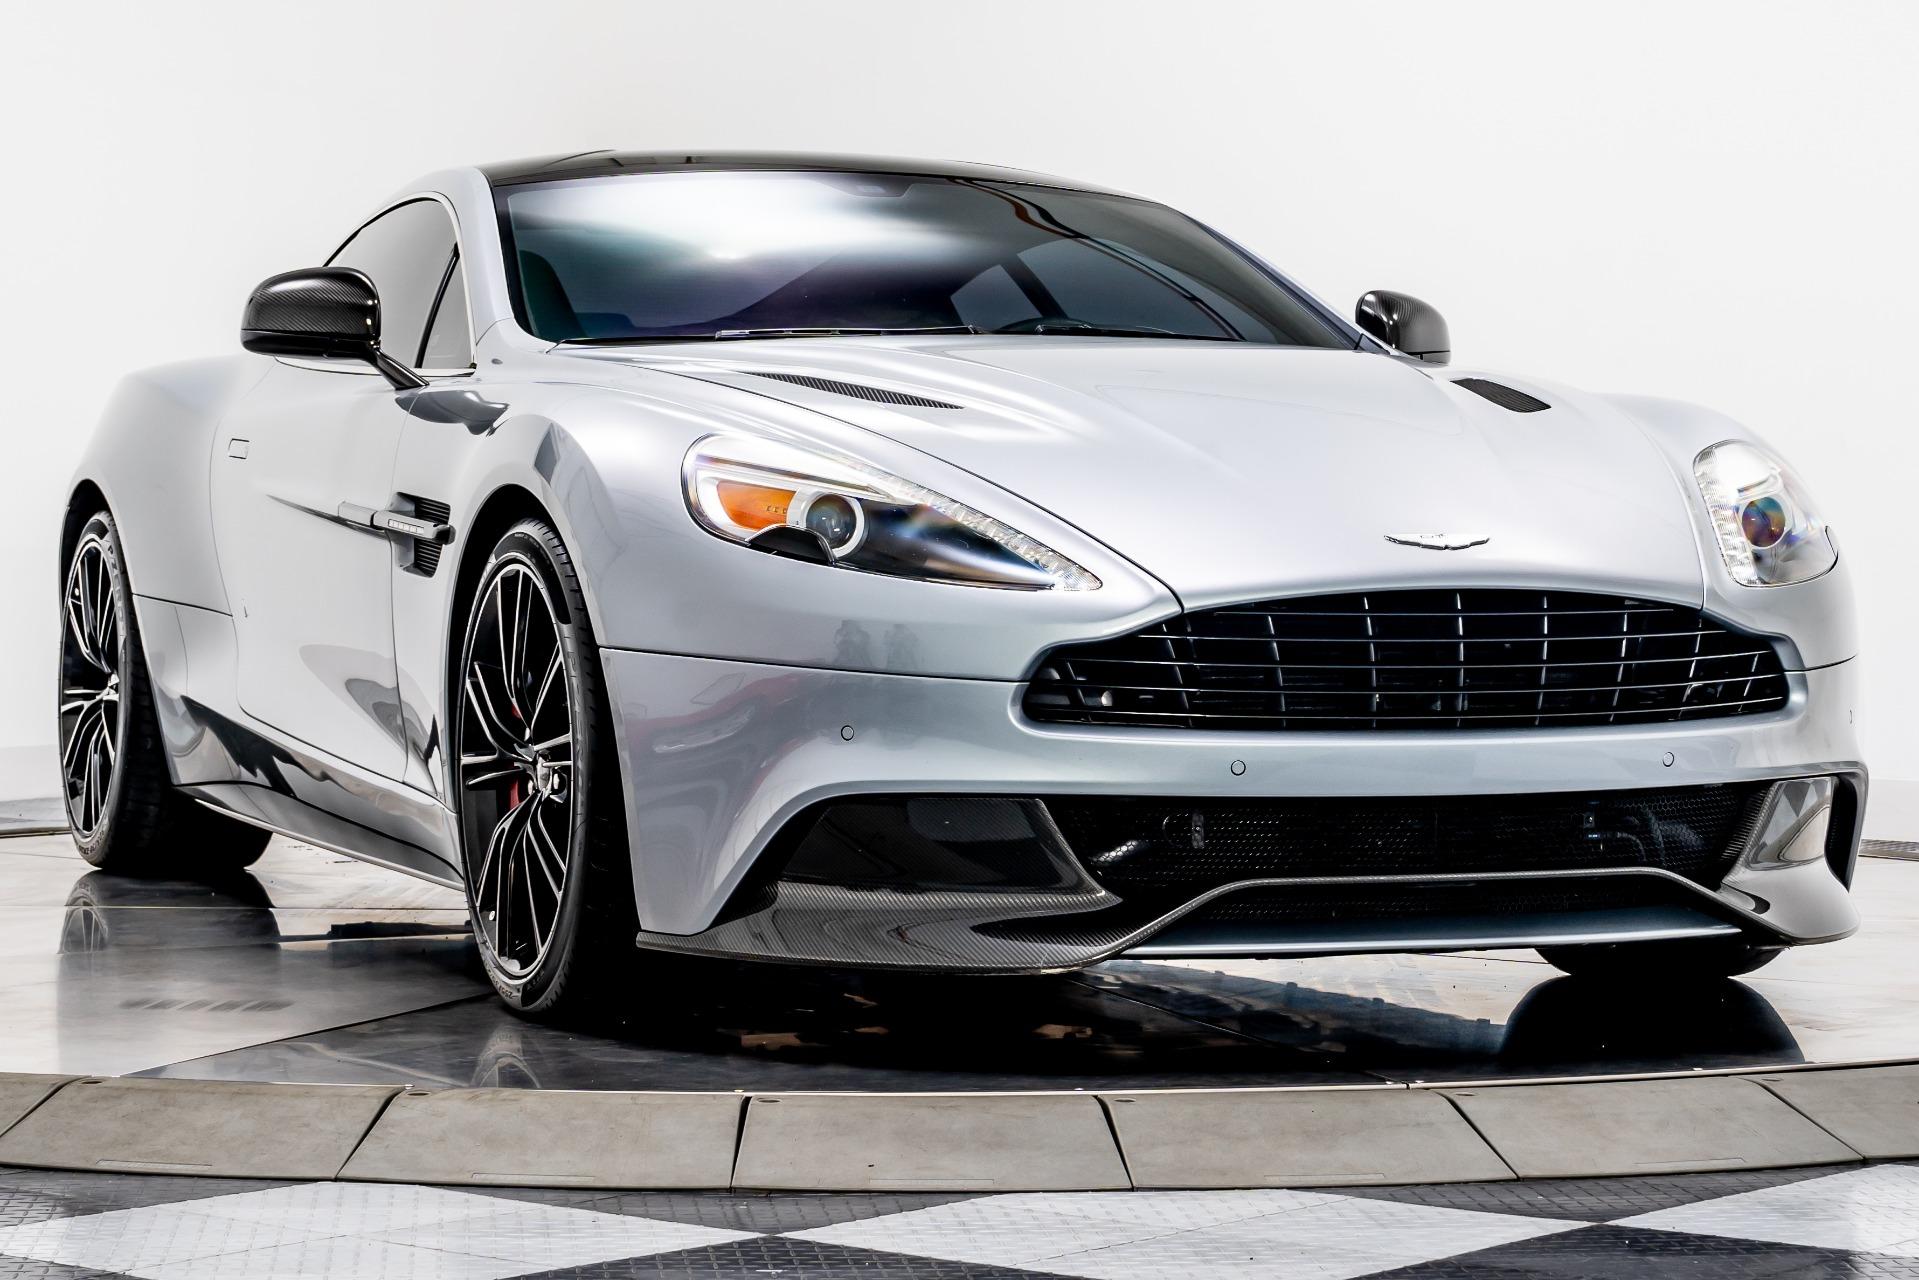 Used 2014 Aston Martin Vanquish For Sale Sold Marshall Goldman Motor Sales Stock W21155